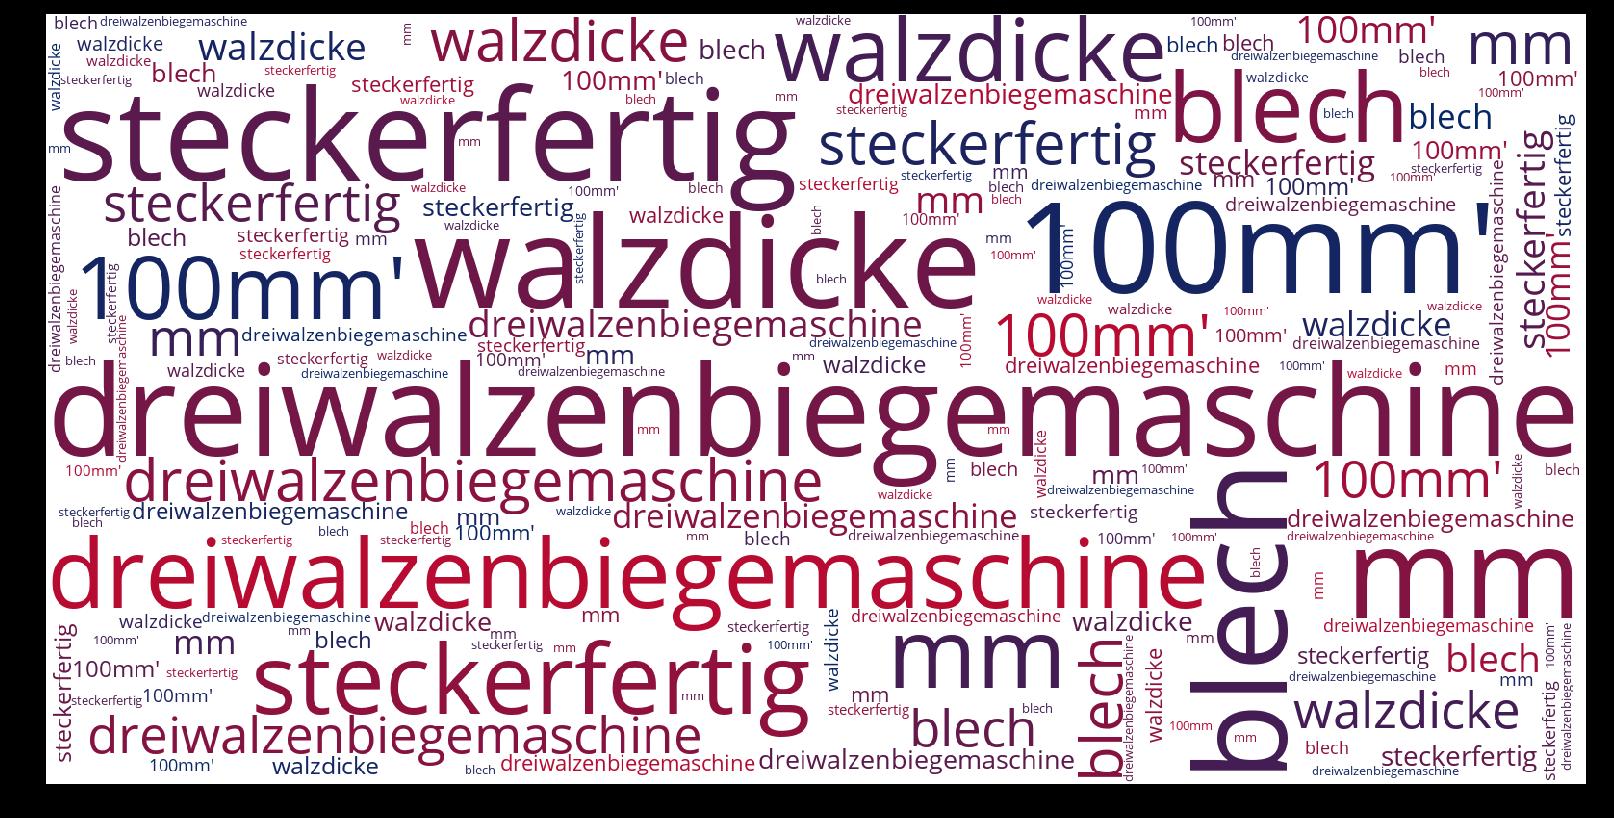 Dreiwalzenbiegemaschine-wordcloud